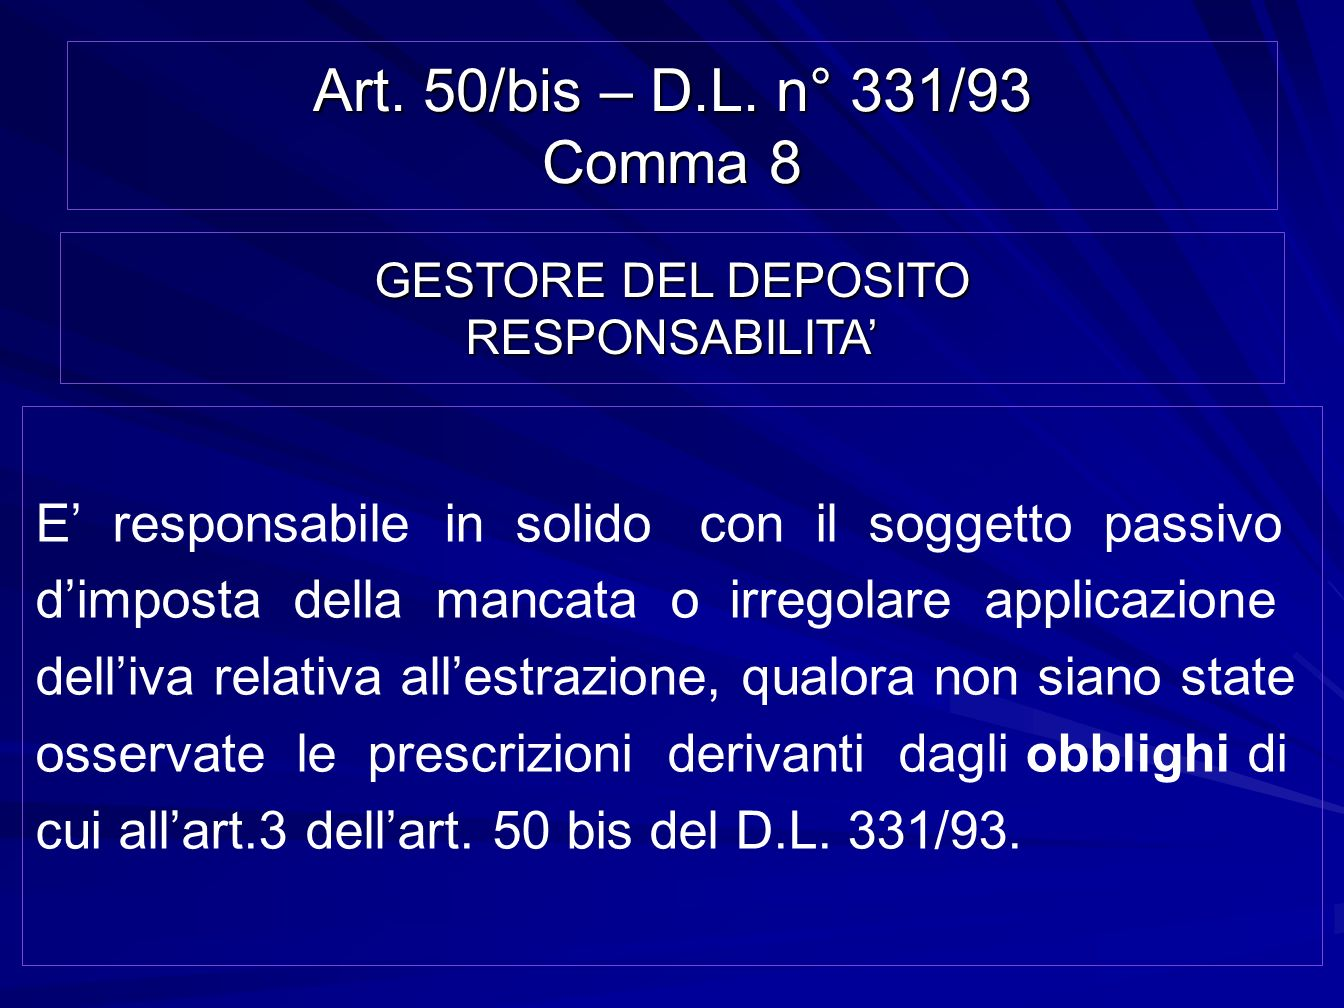 GESTORE DEL DEPOSITO RESPONSABILITA'